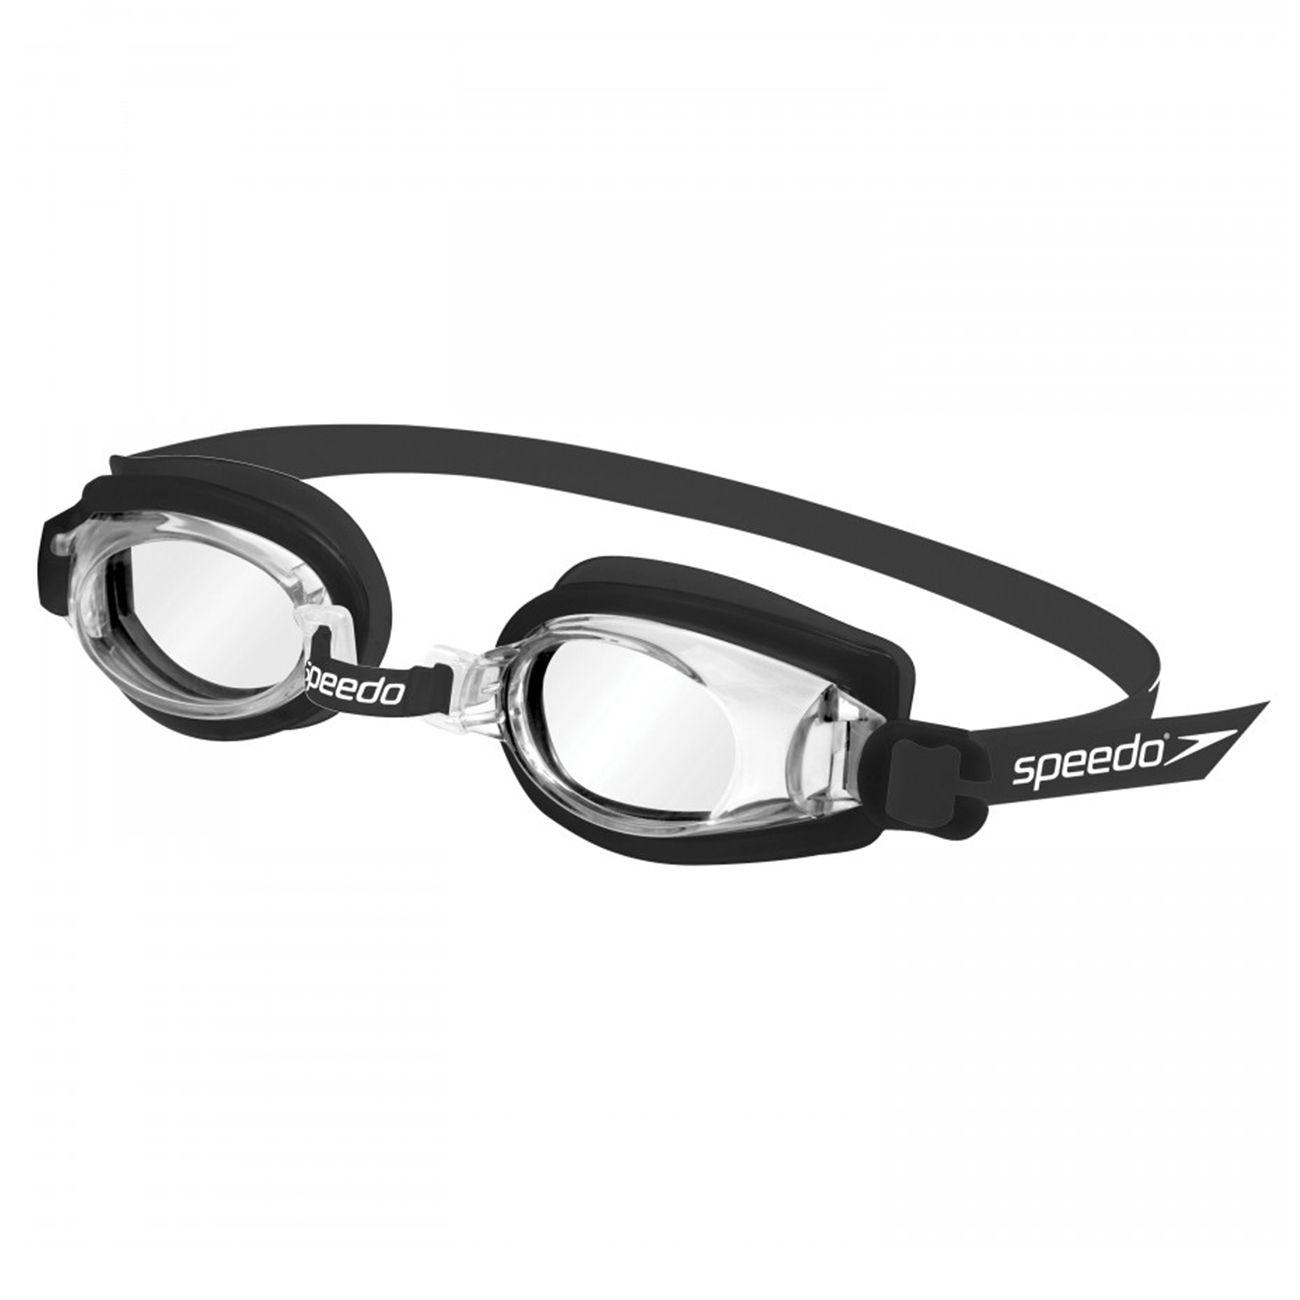 Oculos De Natacao Speedo Jr Captain Preto Cristal